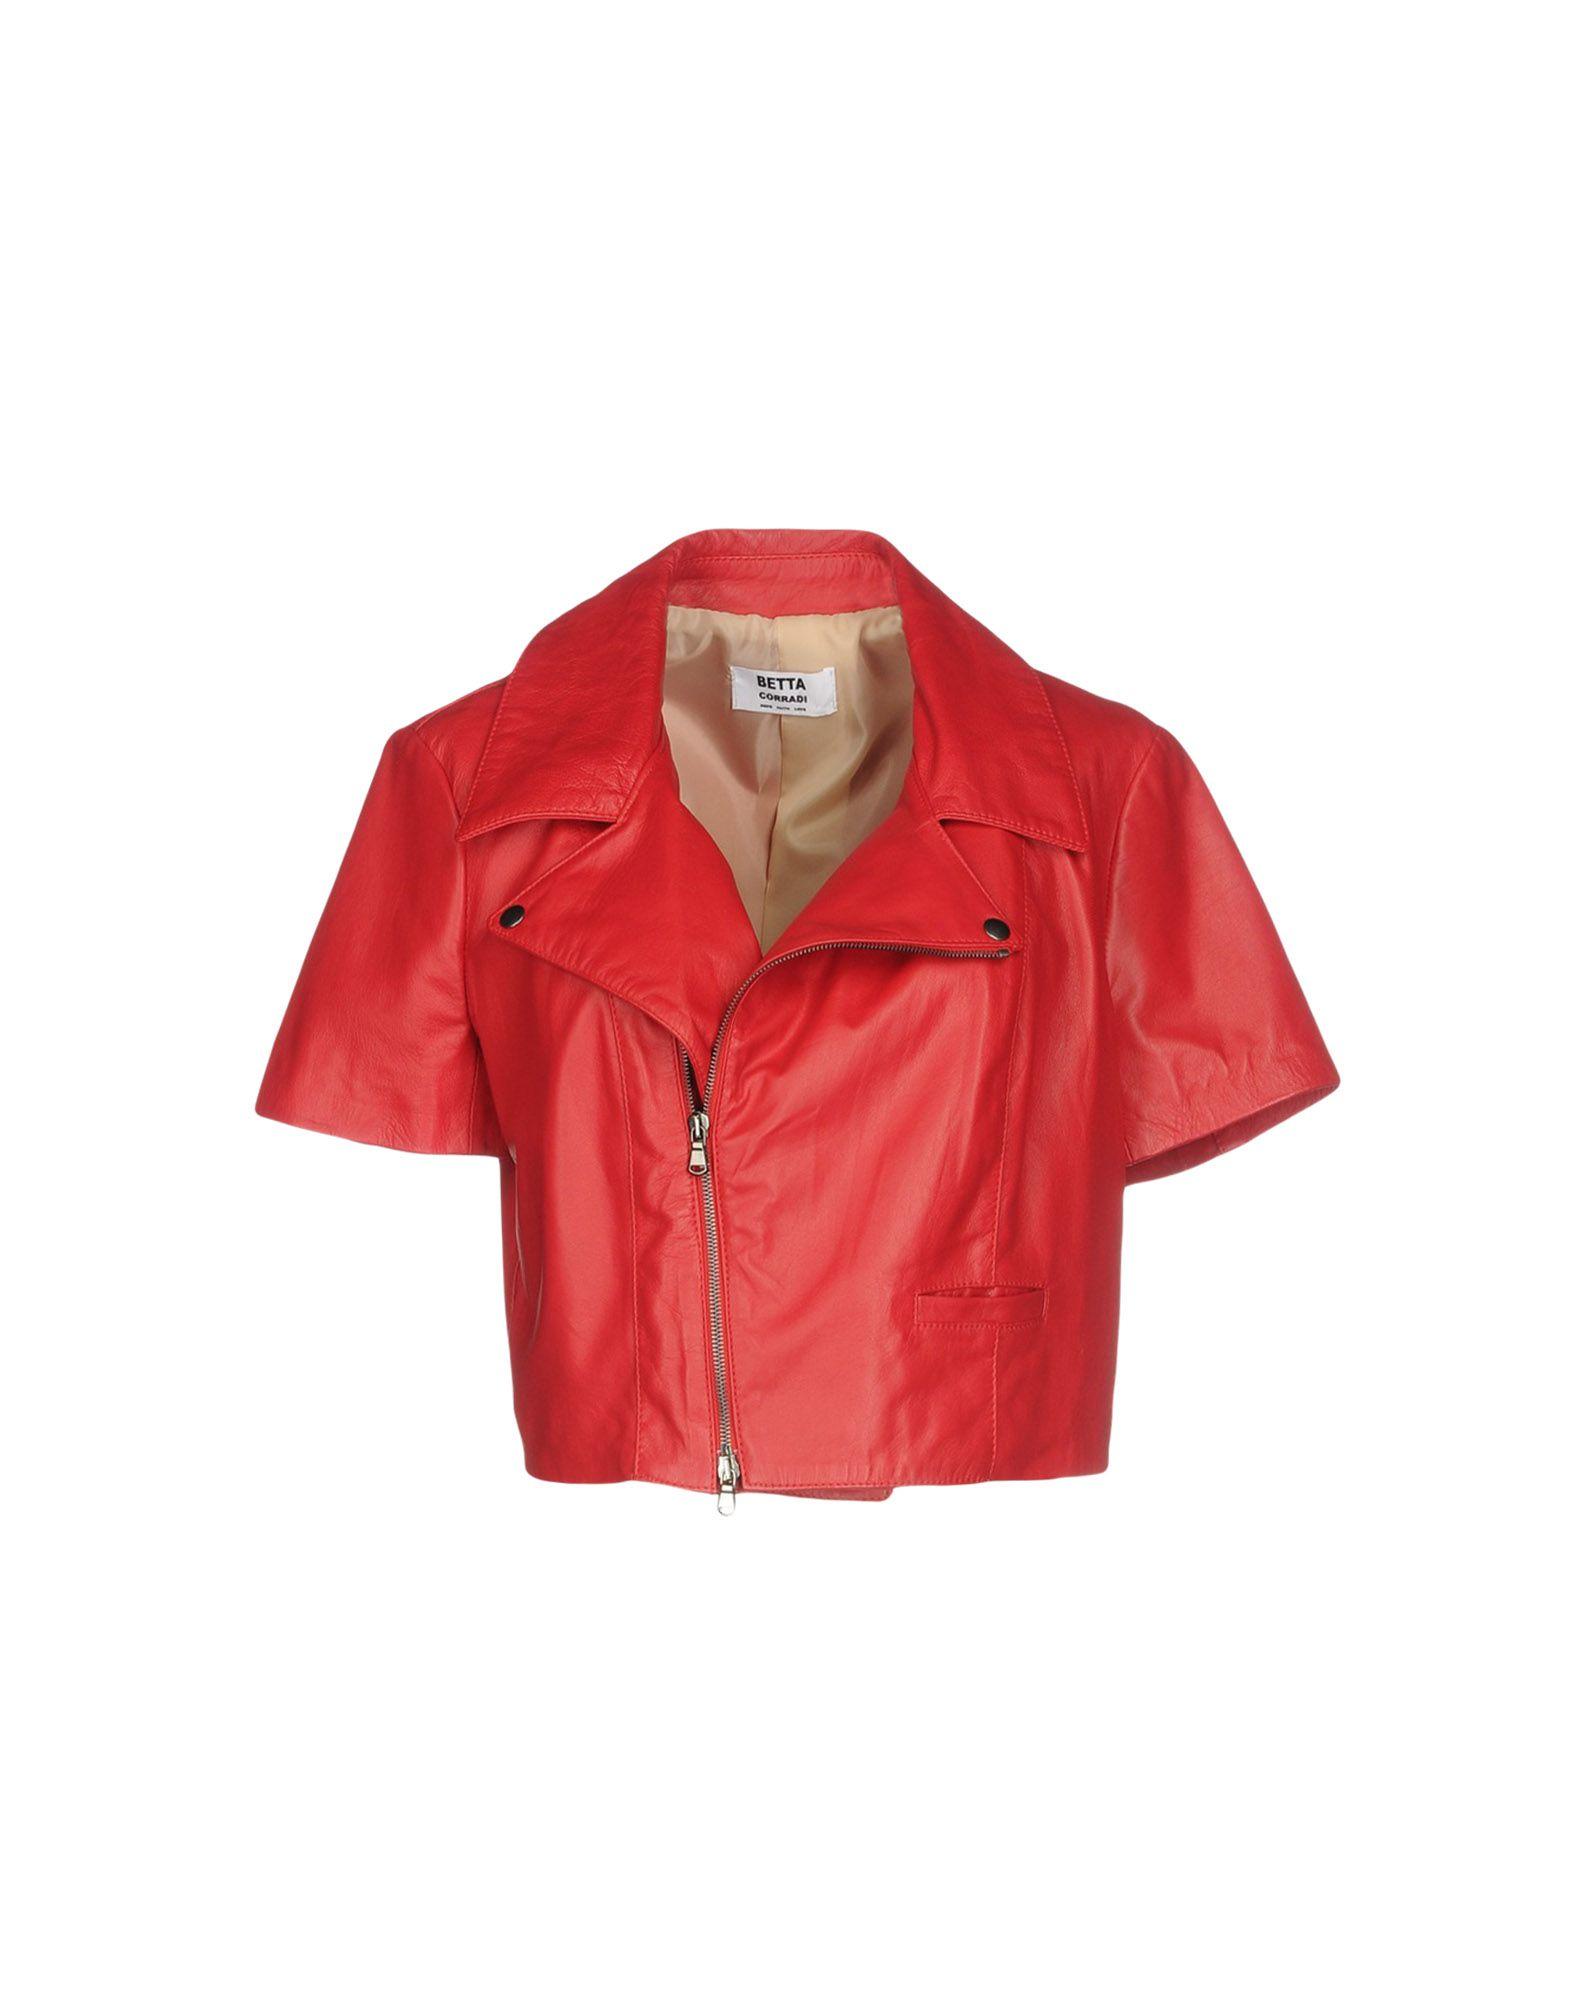 BETTA CORRADI Leather Jacket in Red